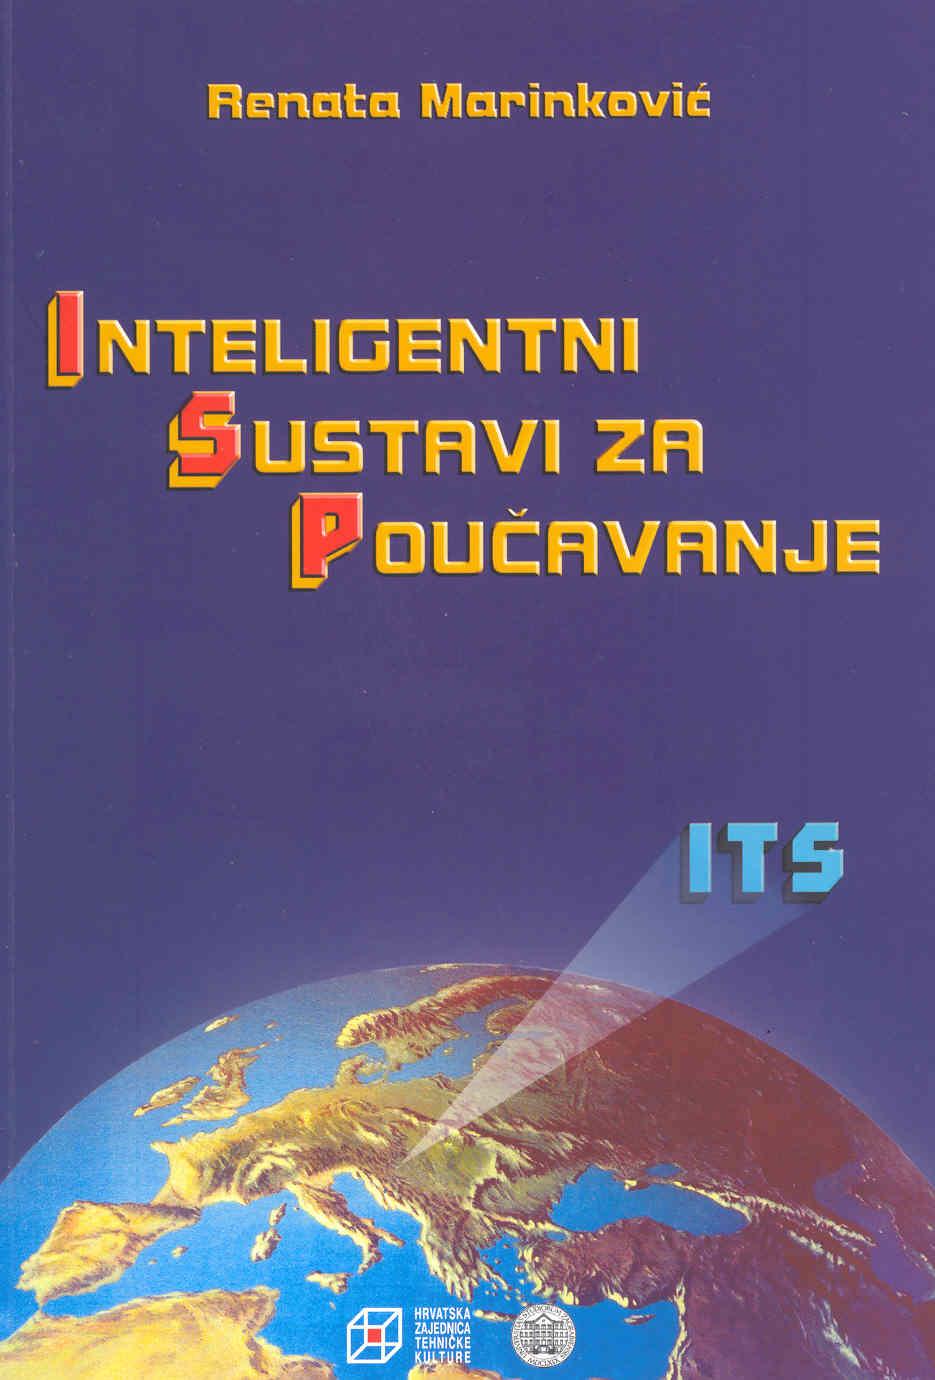 http://hrvatskifokus-2021.ga/wp-content/uploads/2017/09/inteligenstni-sustavi-za-poucavanje.jpg